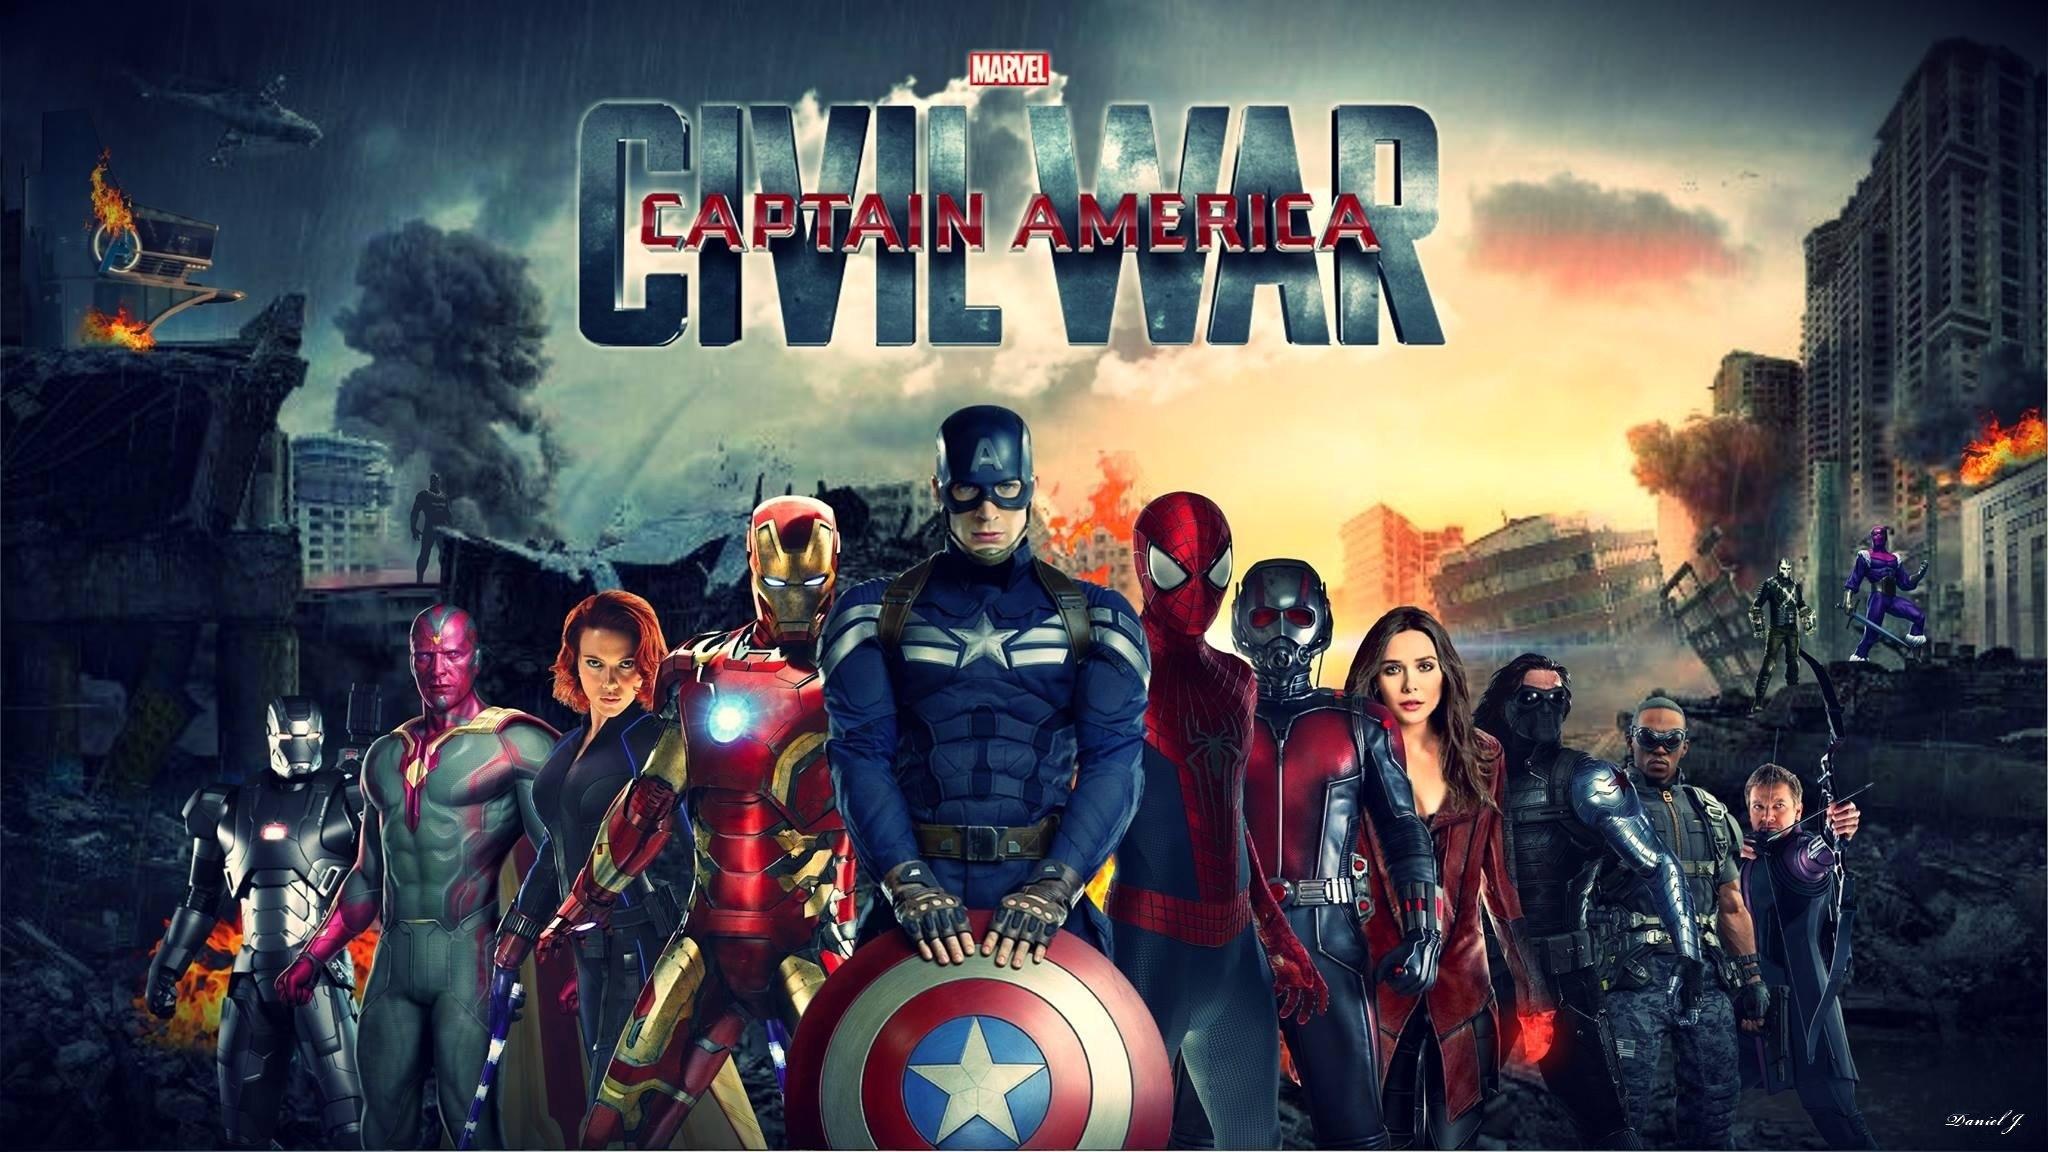 marvel civil war fond d'écran 36+ - collections d'écran hd - szftlgs